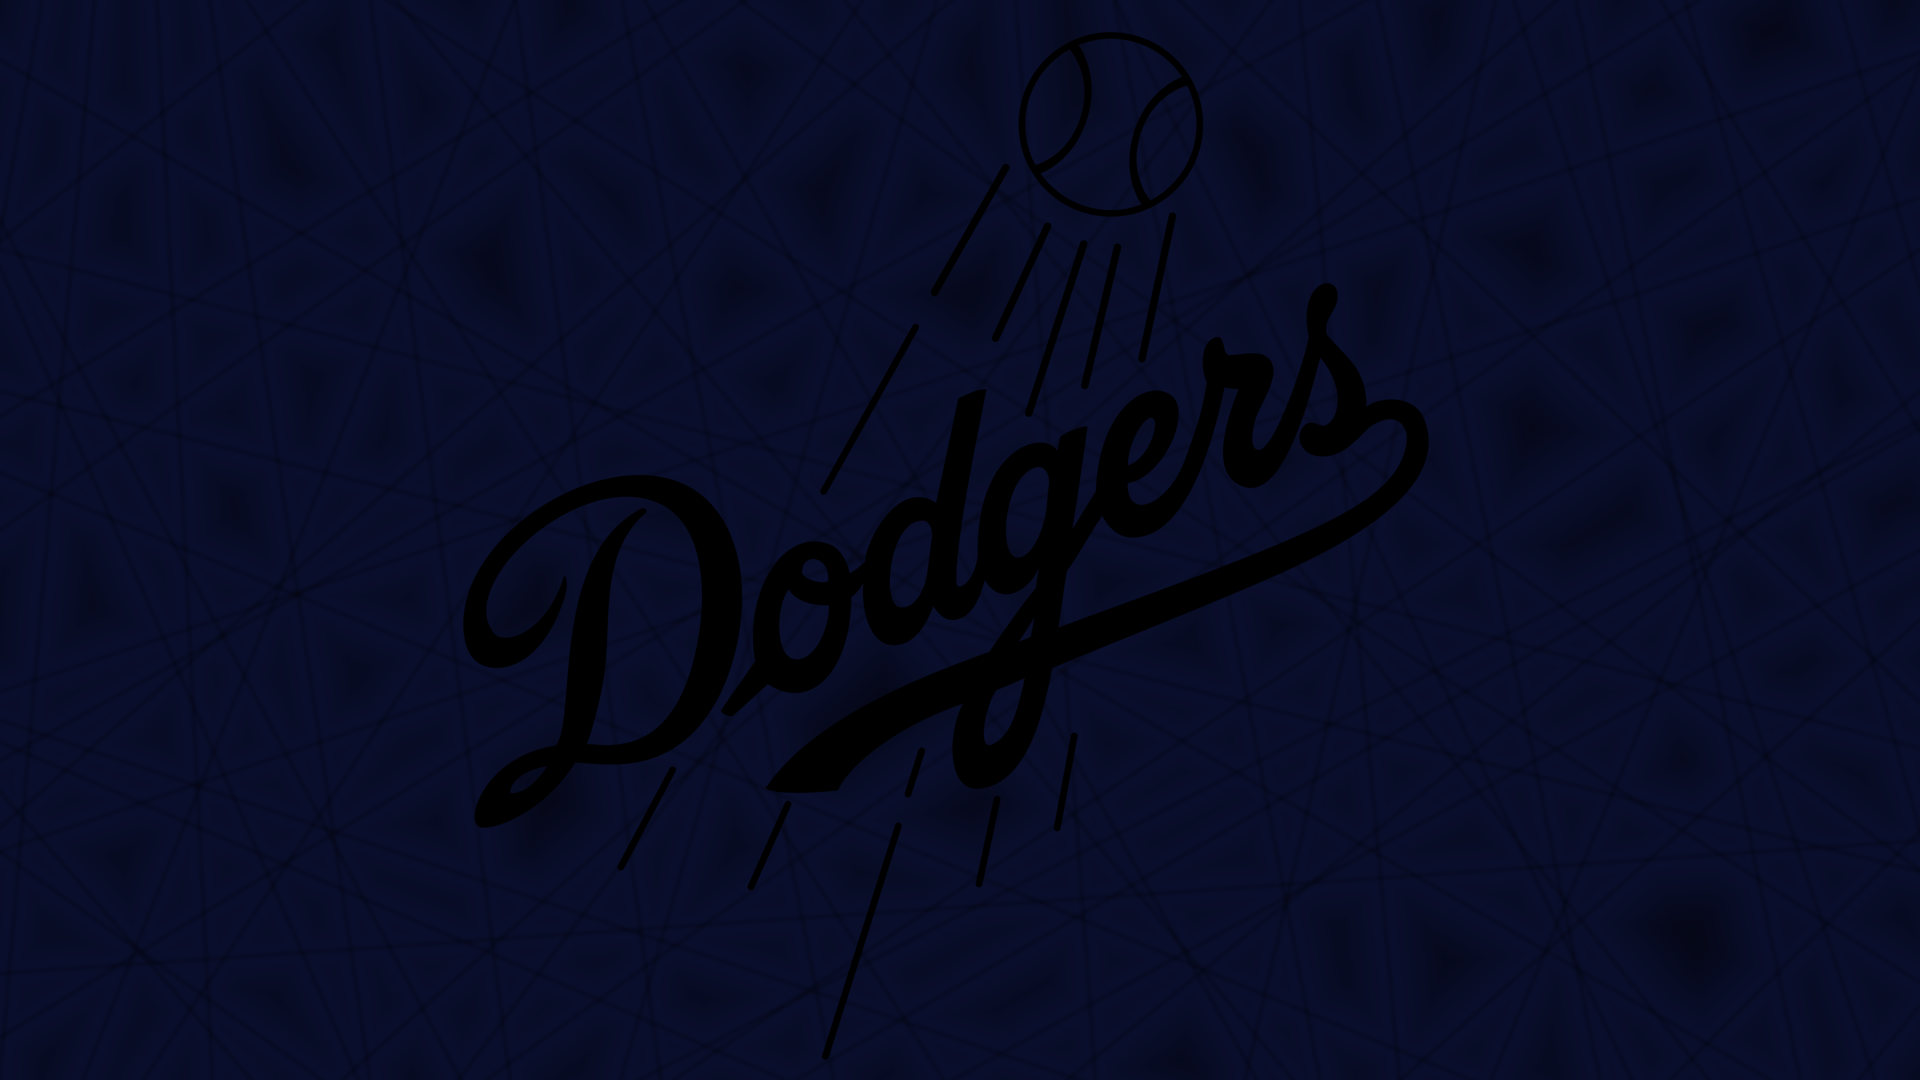 los angeles dodgers baseball wallpapers wallpaper cave